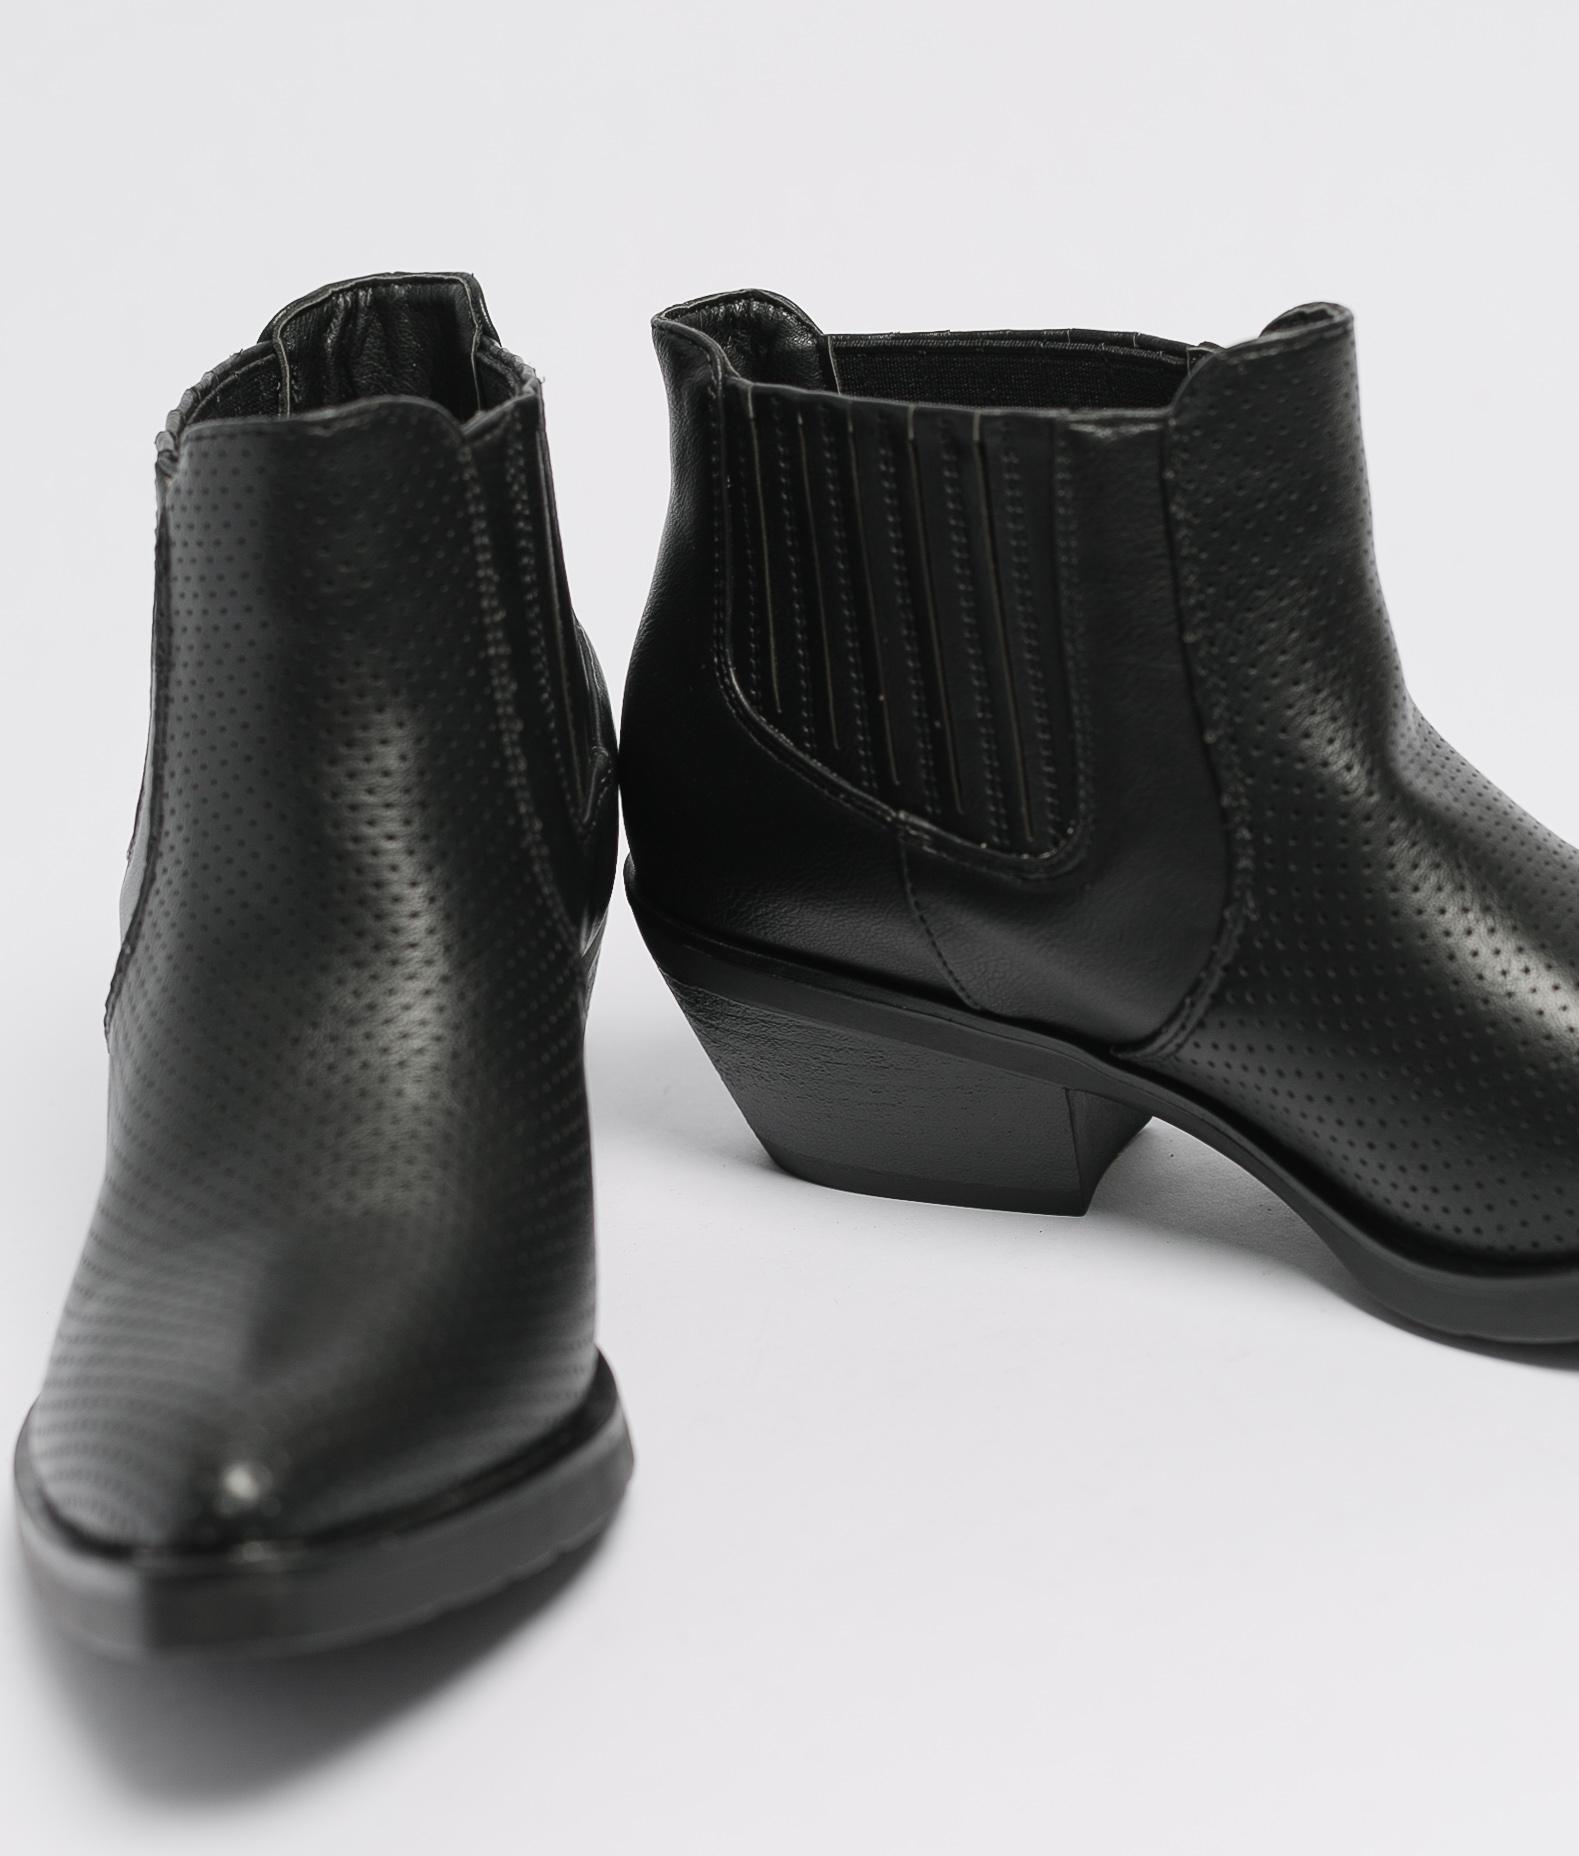 Bota Petite Gilda - Noir